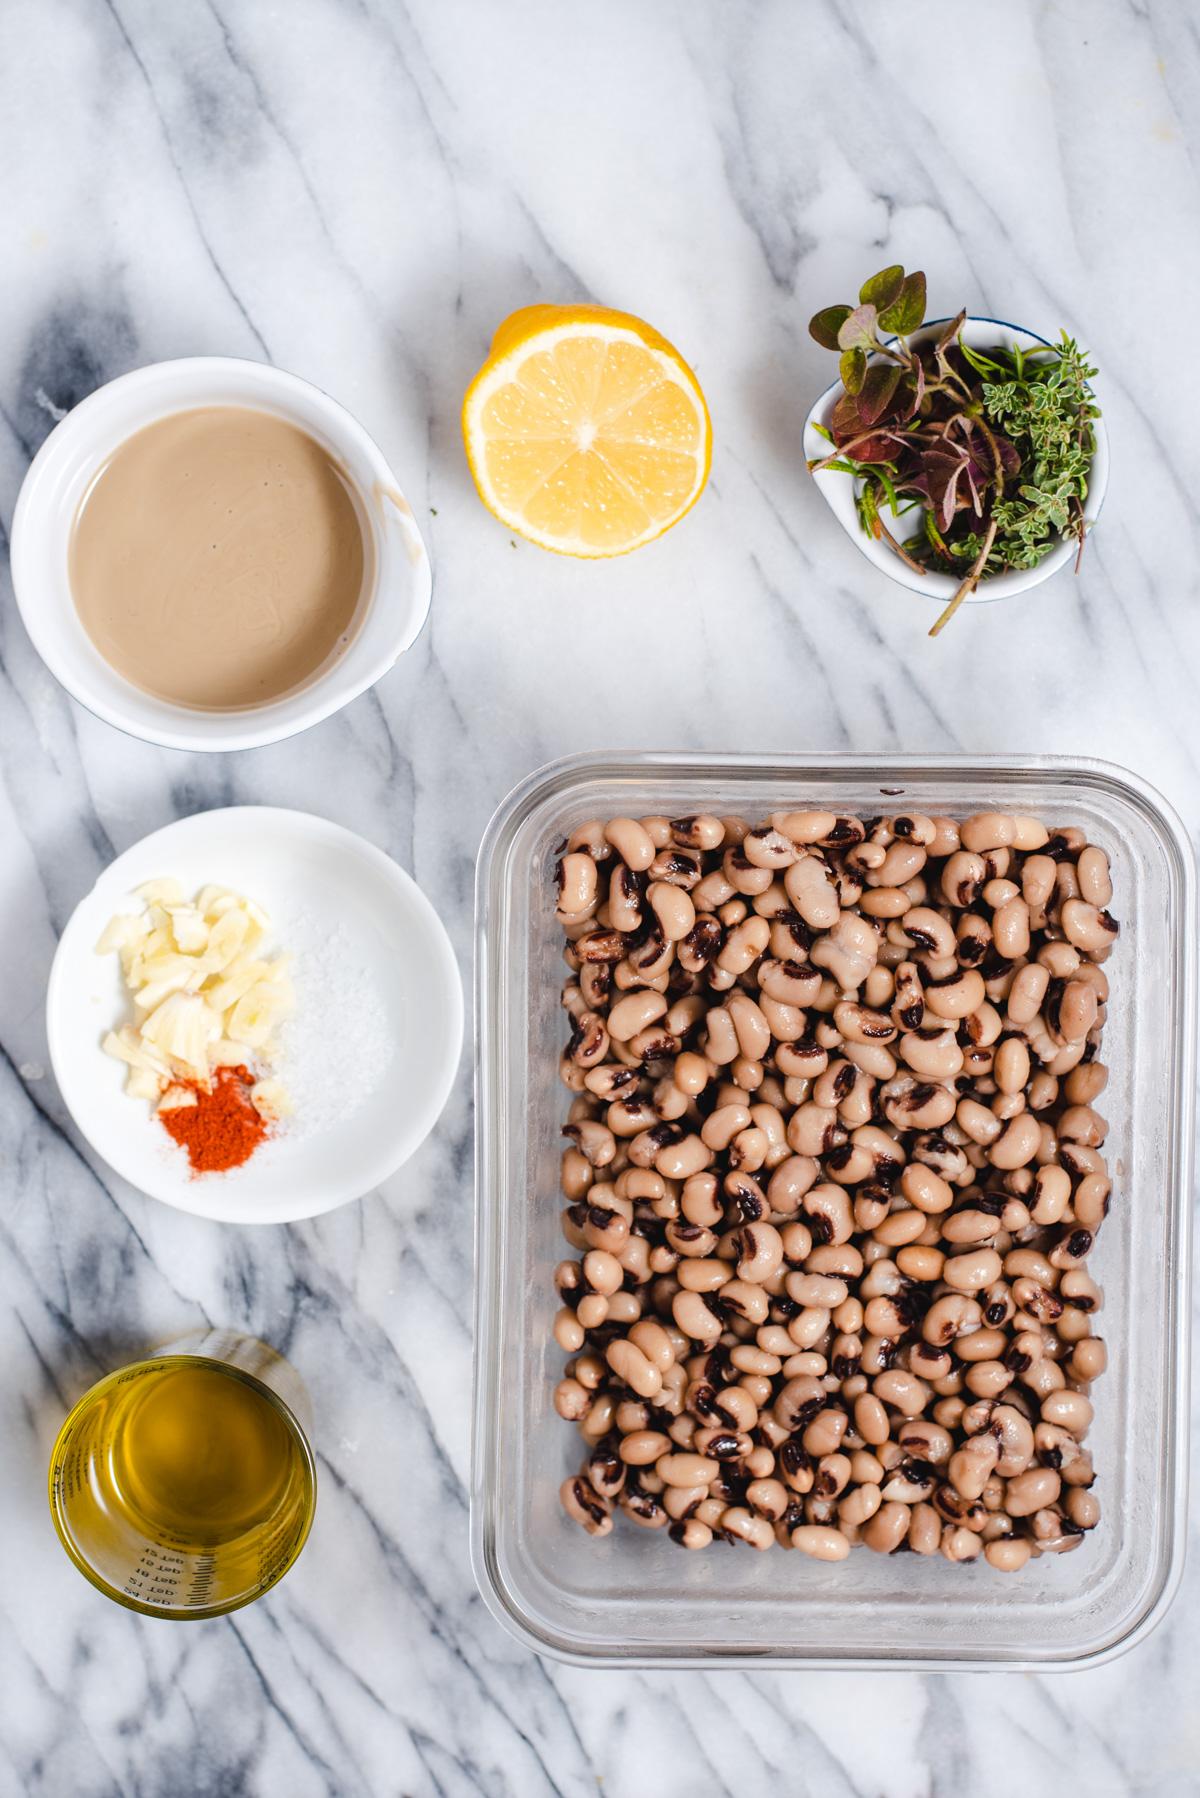 Ingredients to make black eyed pea hummus on a marble background